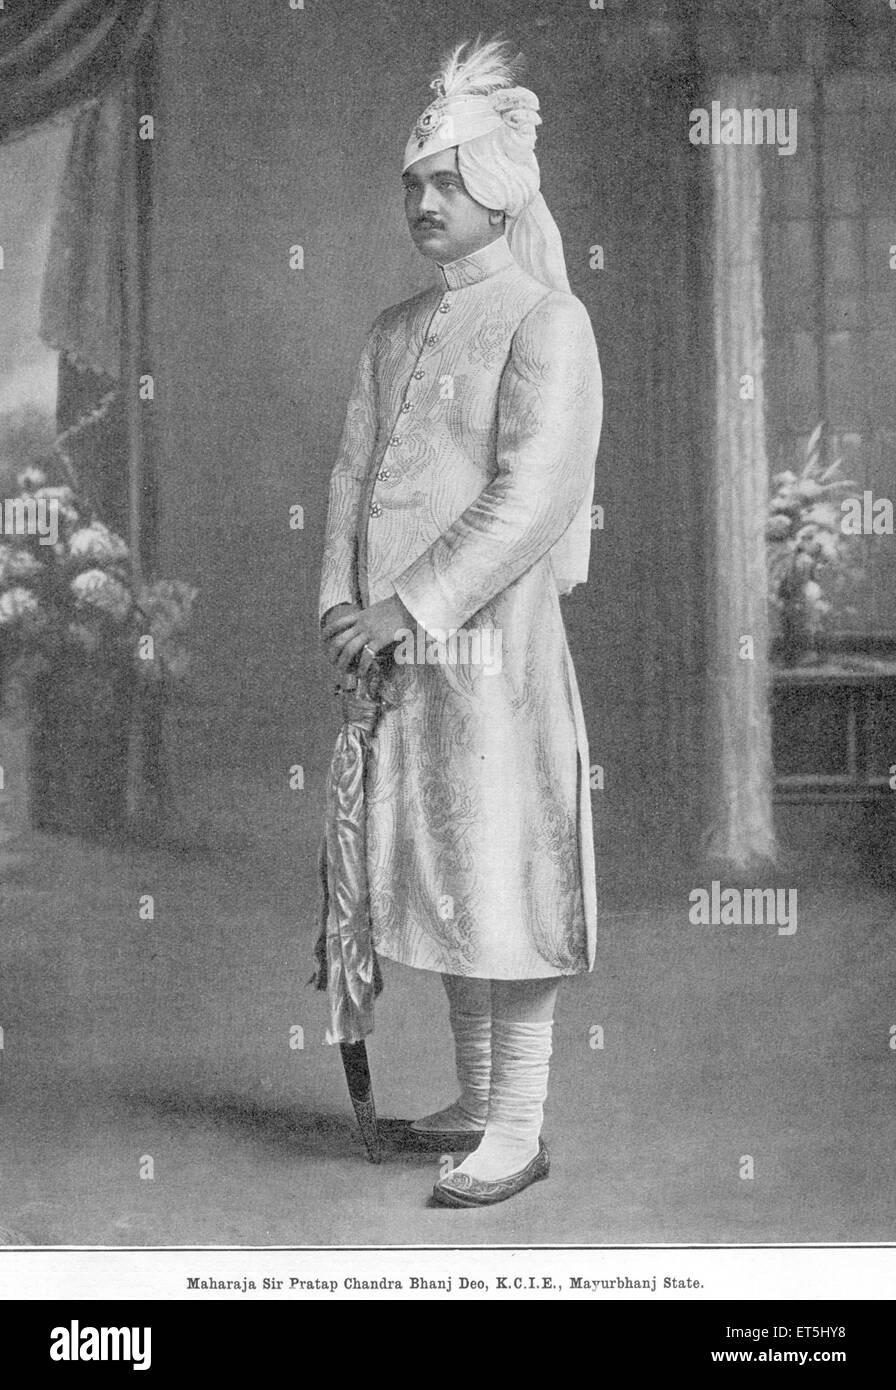 Princes of India Maharaja Sir Pratap Chandra Bhanj Deo K.C.I.E. Mayurbhanj State Orissa Odisha India - Stock Image